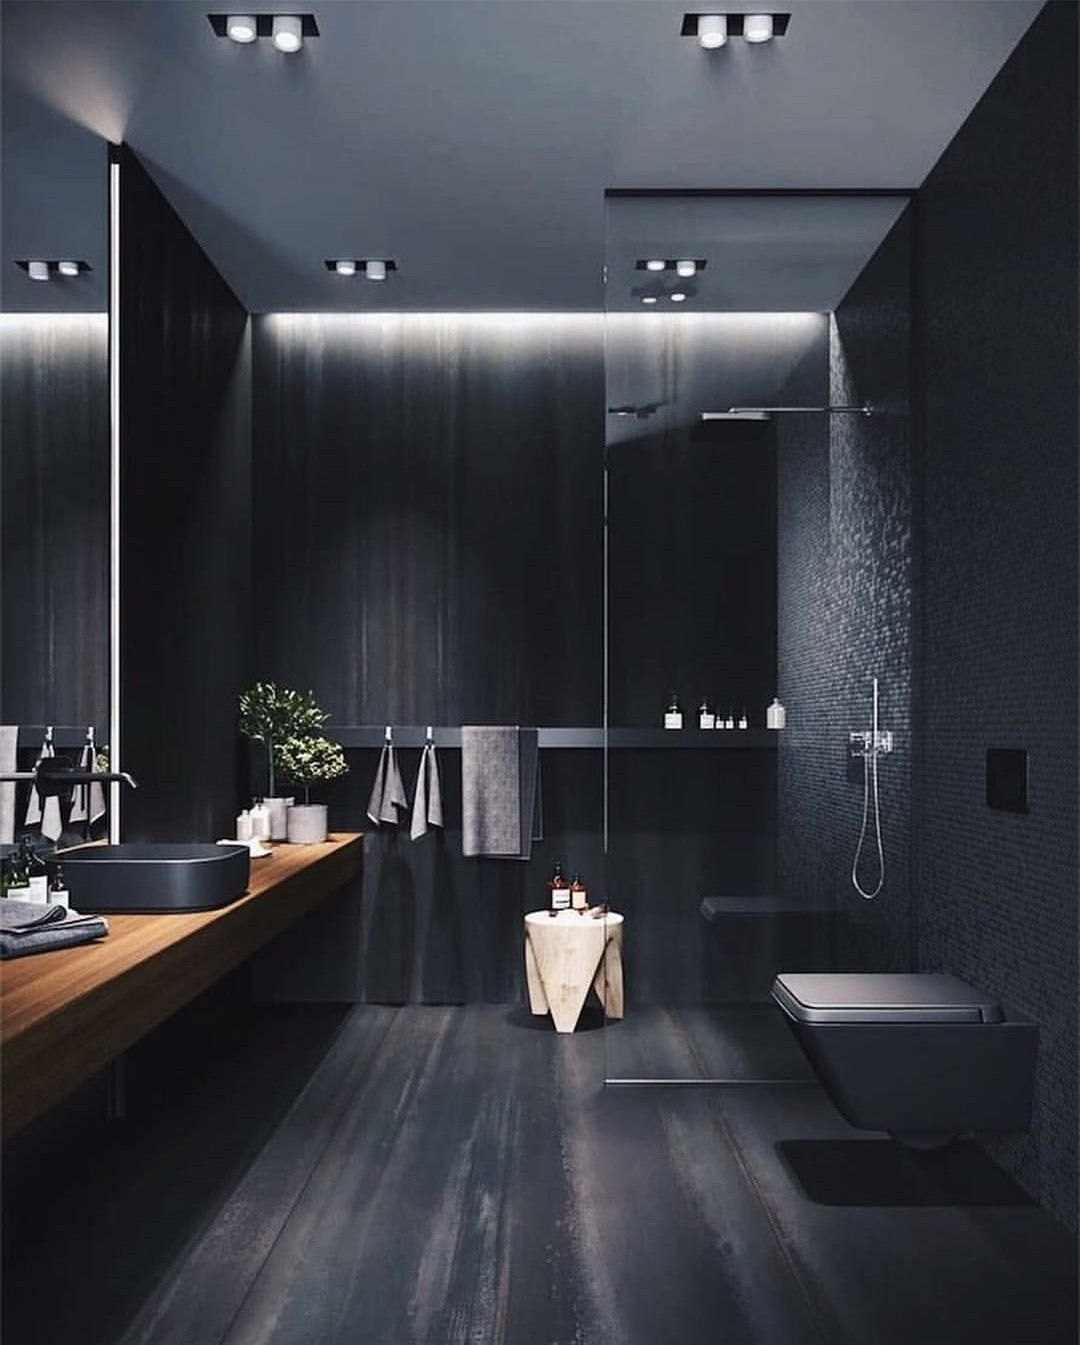 Gray black and sleek Bathroom decor in 2019 | Modern ...